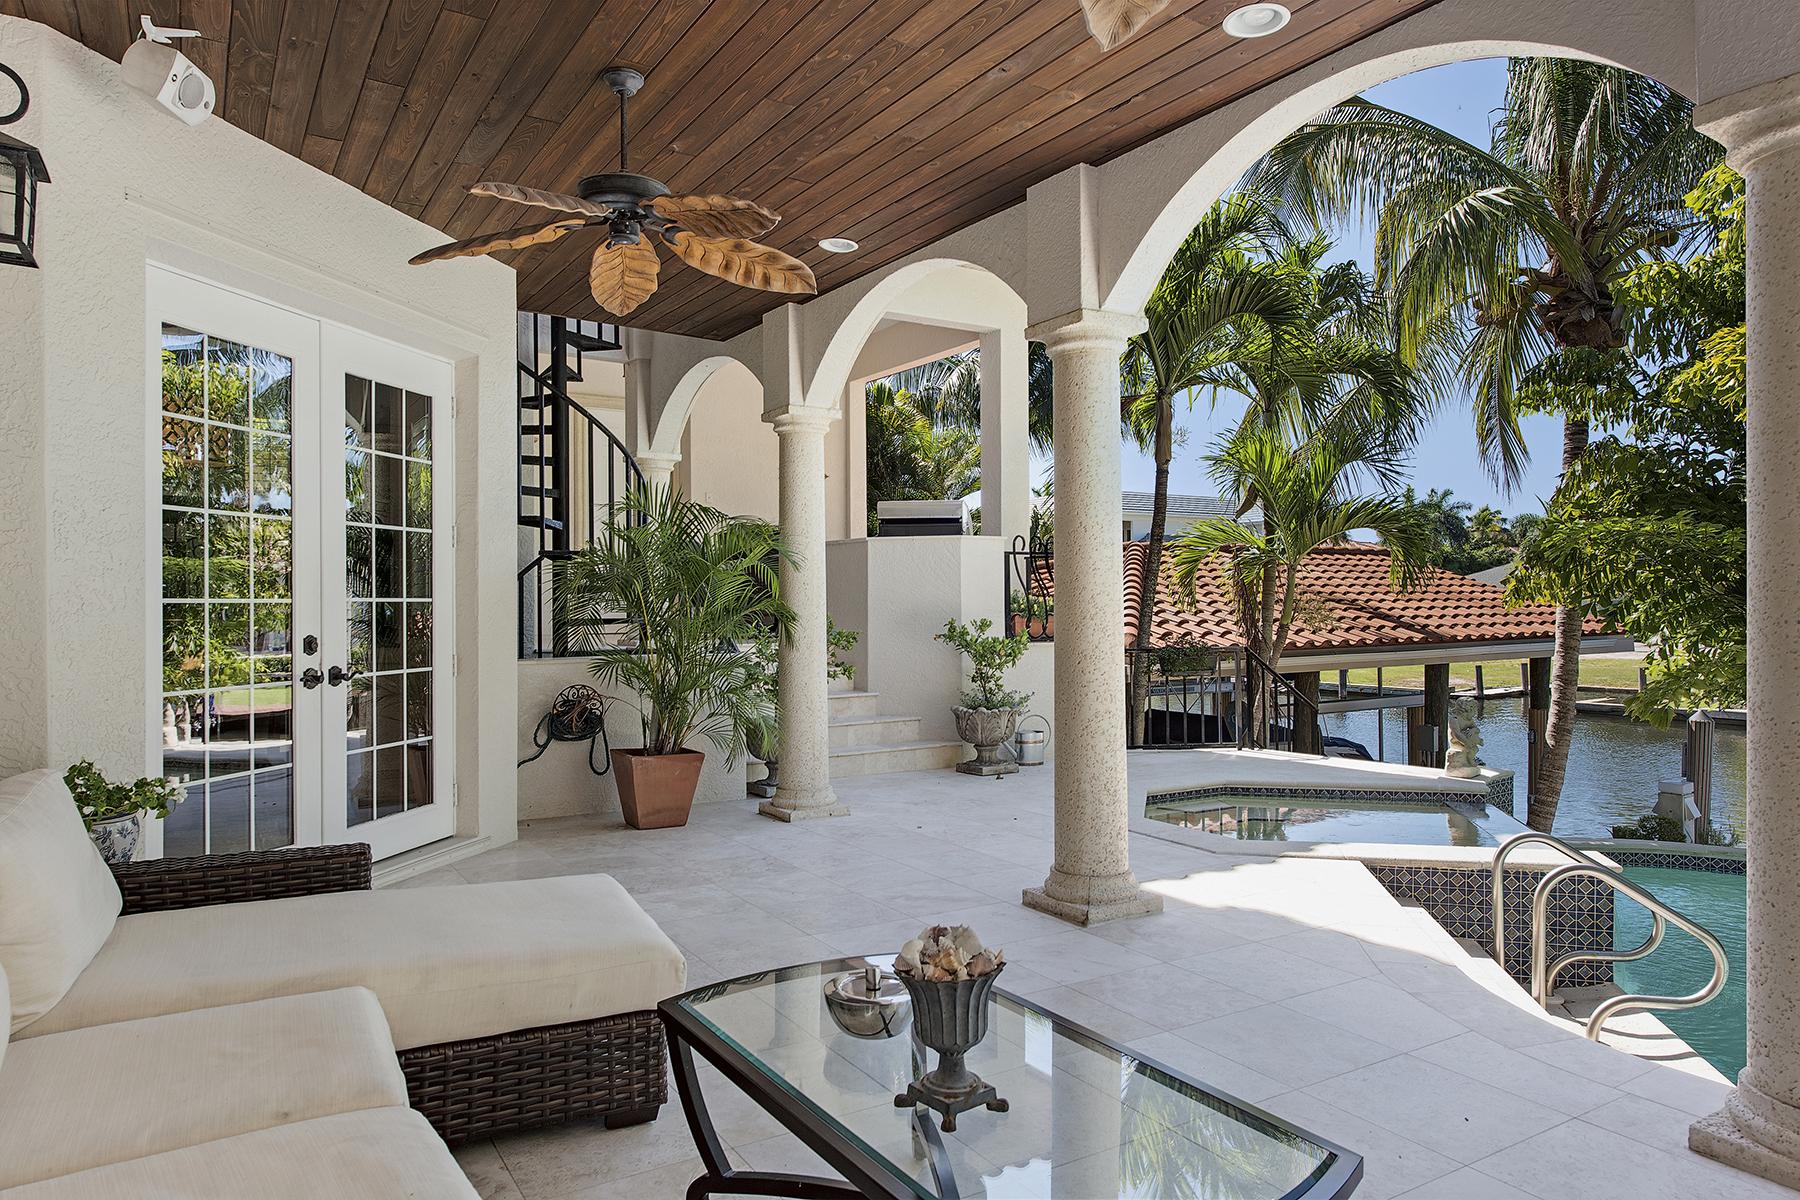 Villa per Vendita alle ore AQUALANE SHORES 656 16th Ave S Aqualane Shores, Naples, Florida 34102 Stati Uniti